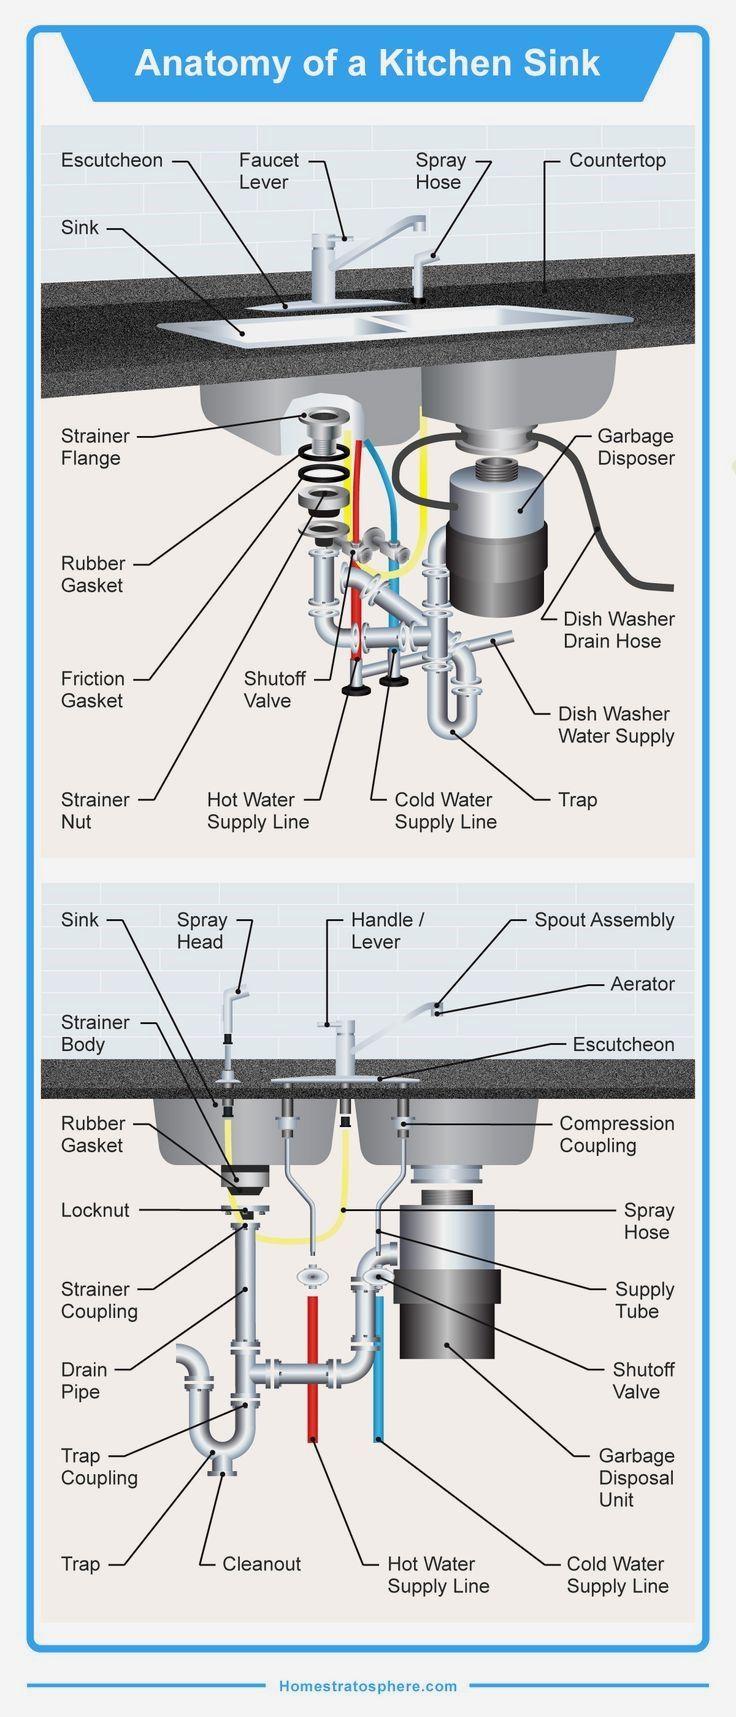 24 Kitchen Sink Vent Diagram Ideas Manual Guide